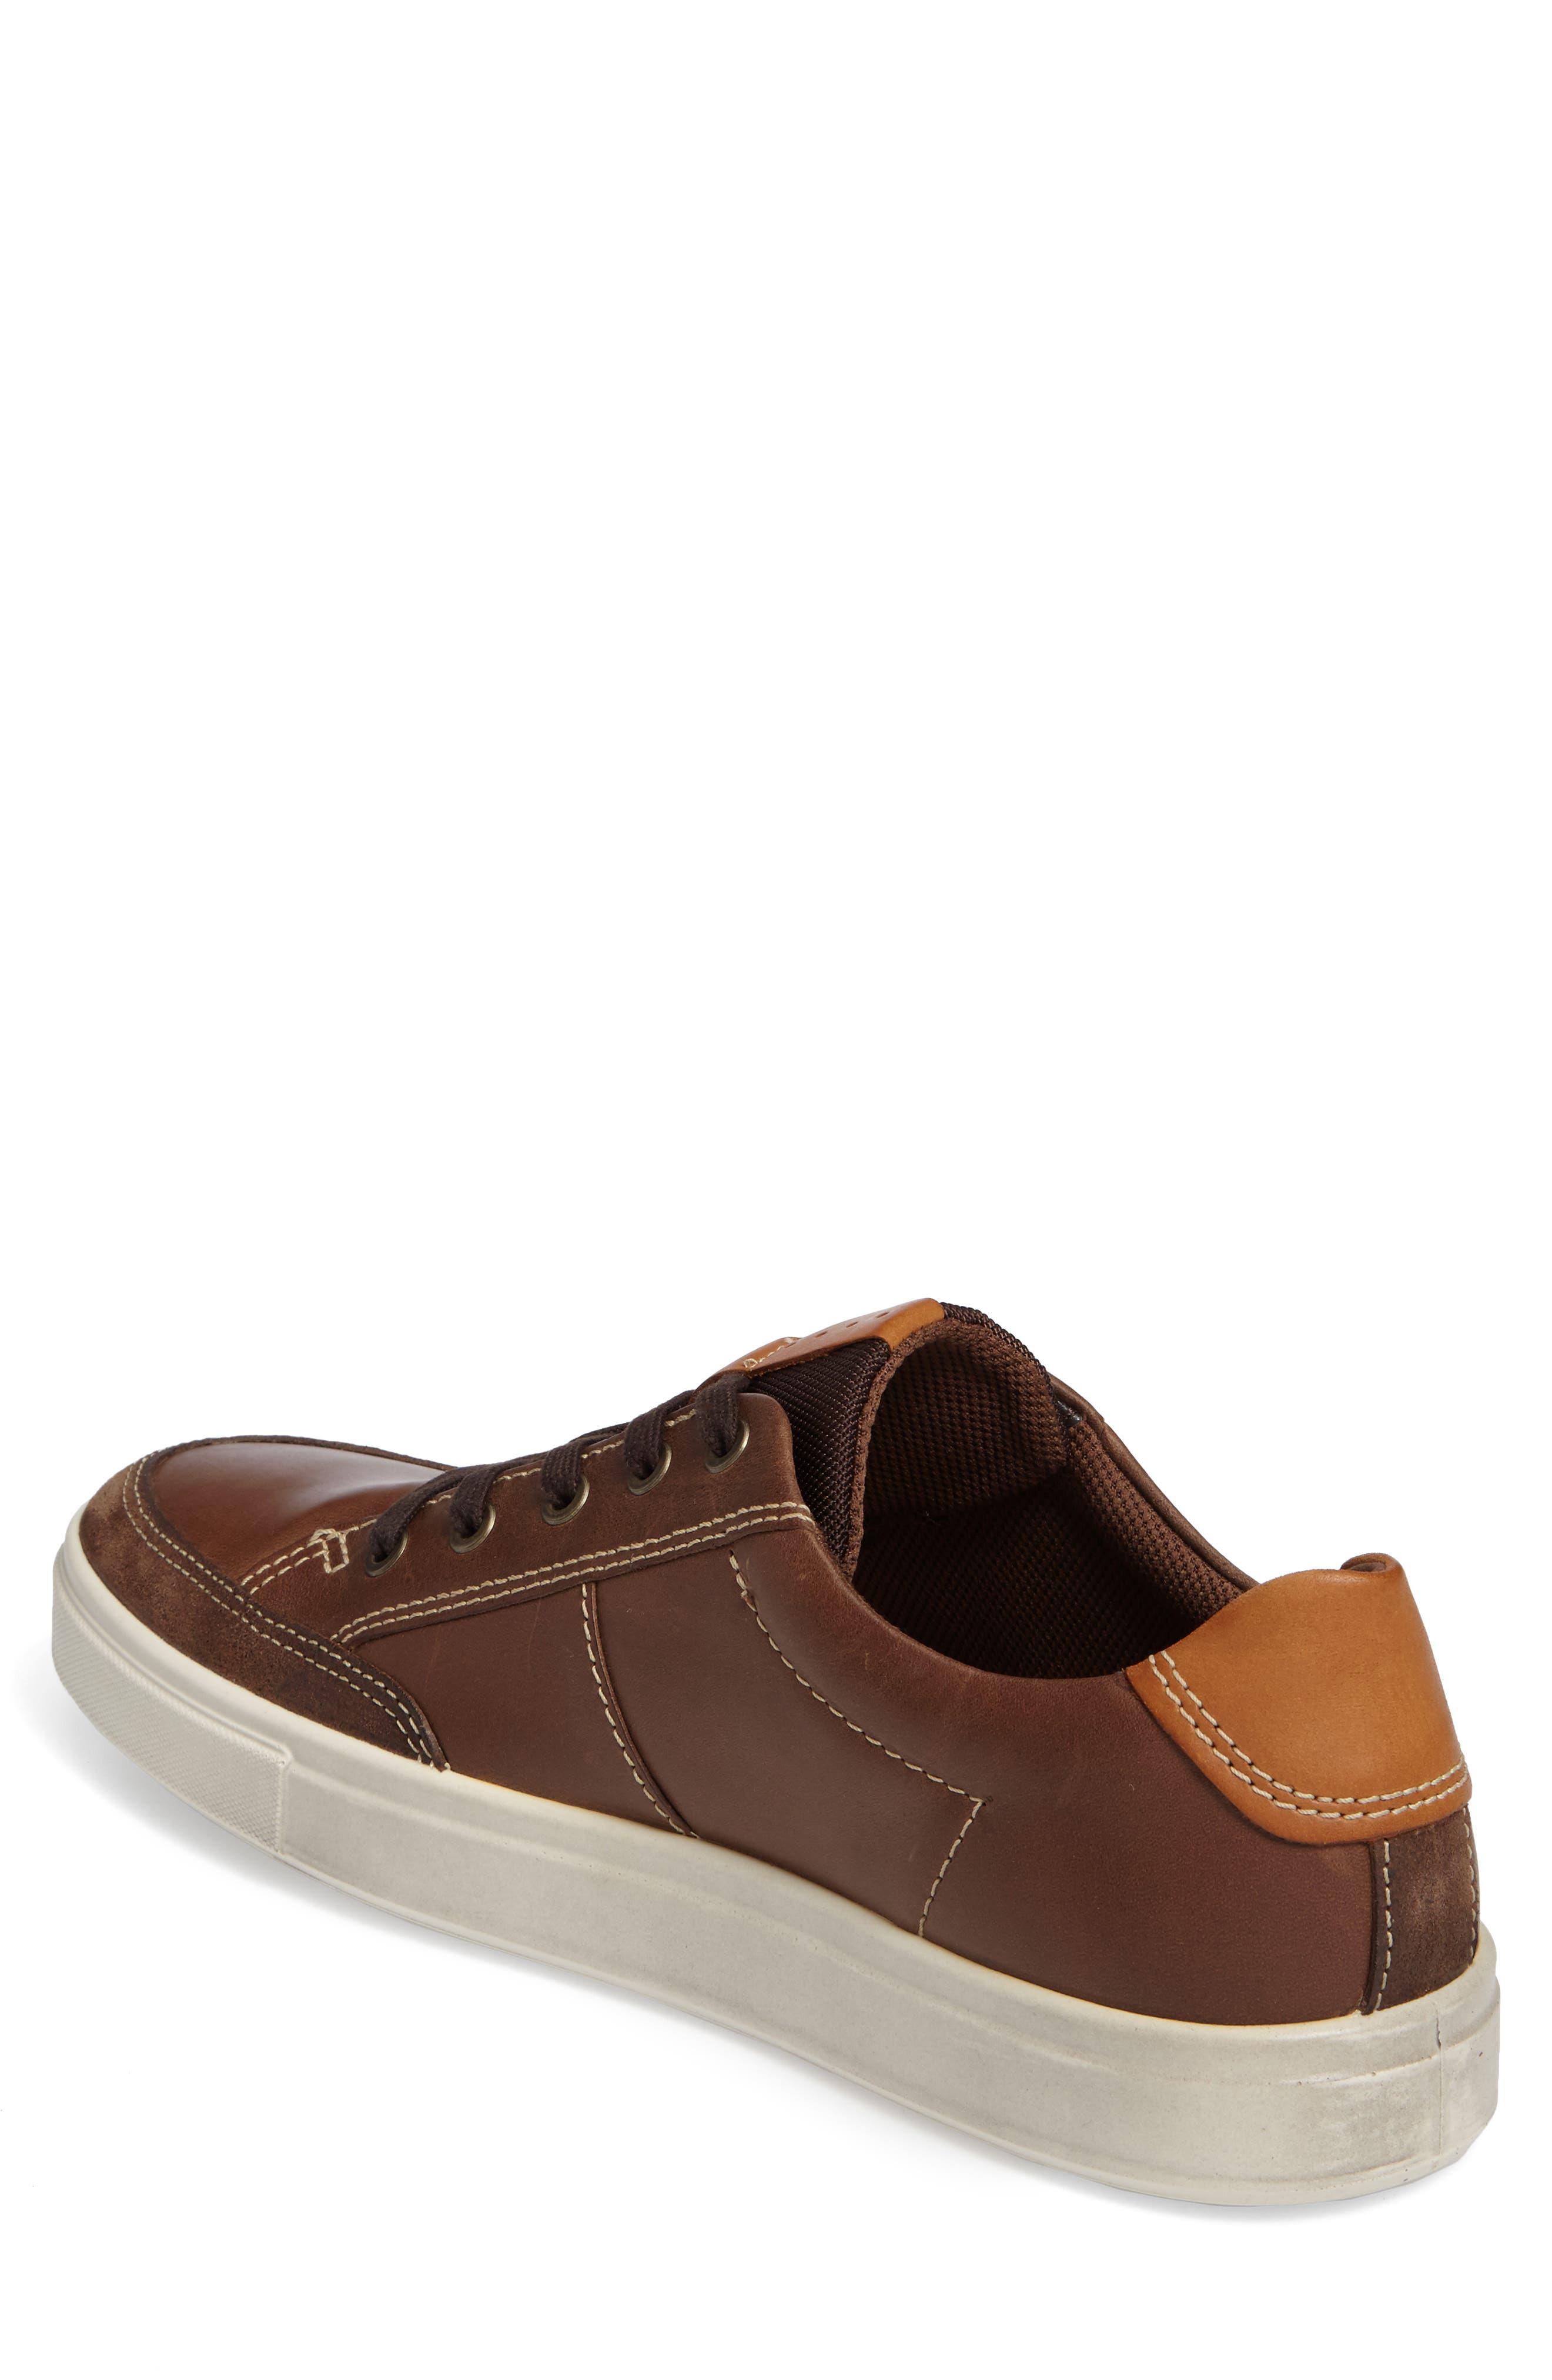 Kyle Classic Sneaker,                             Alternate thumbnail 2, color,                             237